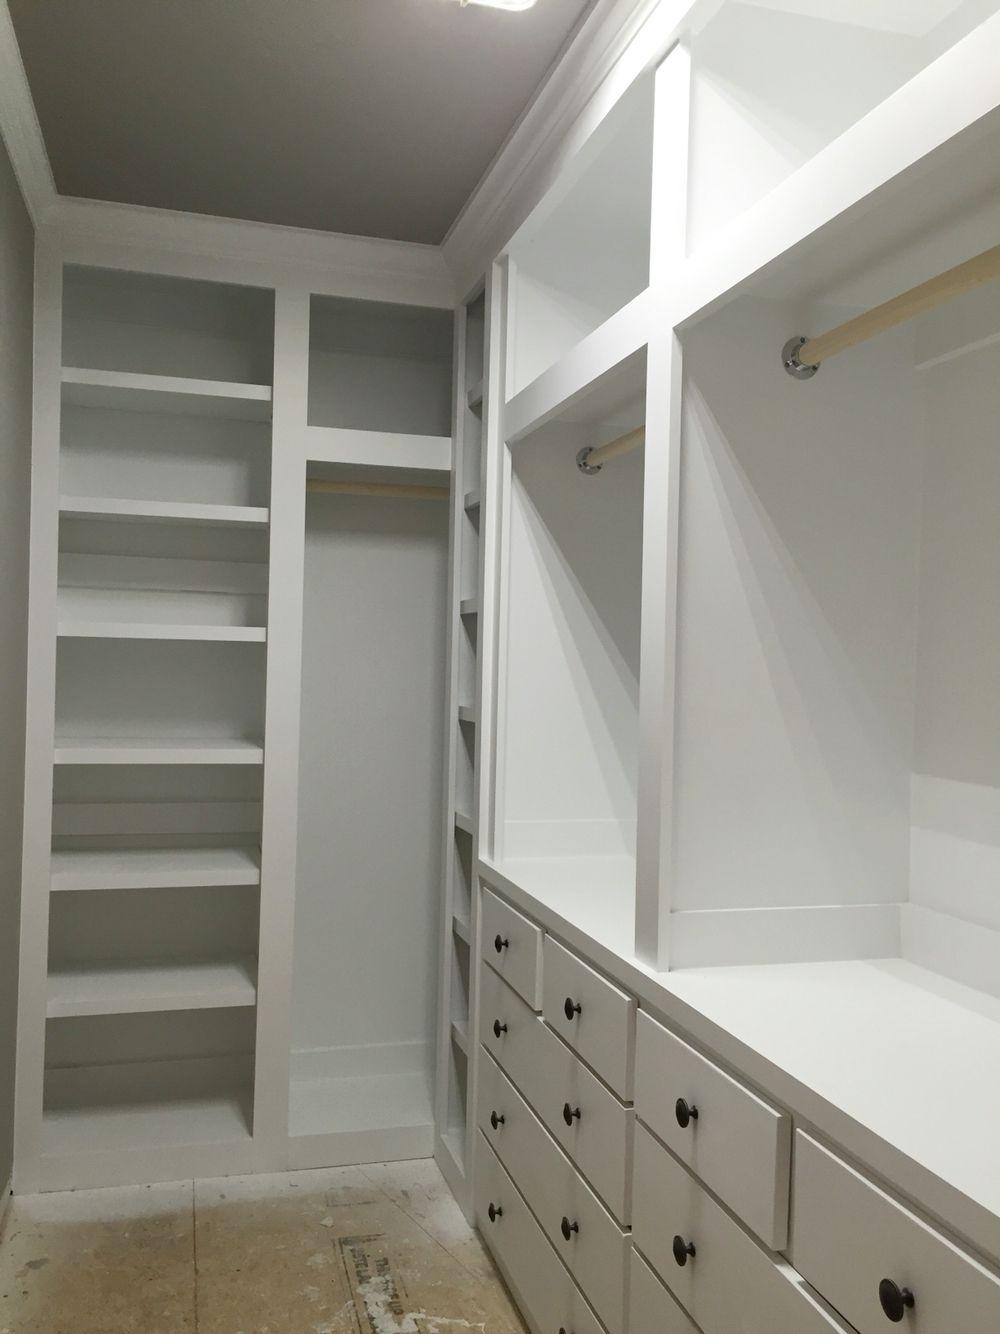 Built in closet in 11 foot by 5 foot room closet built